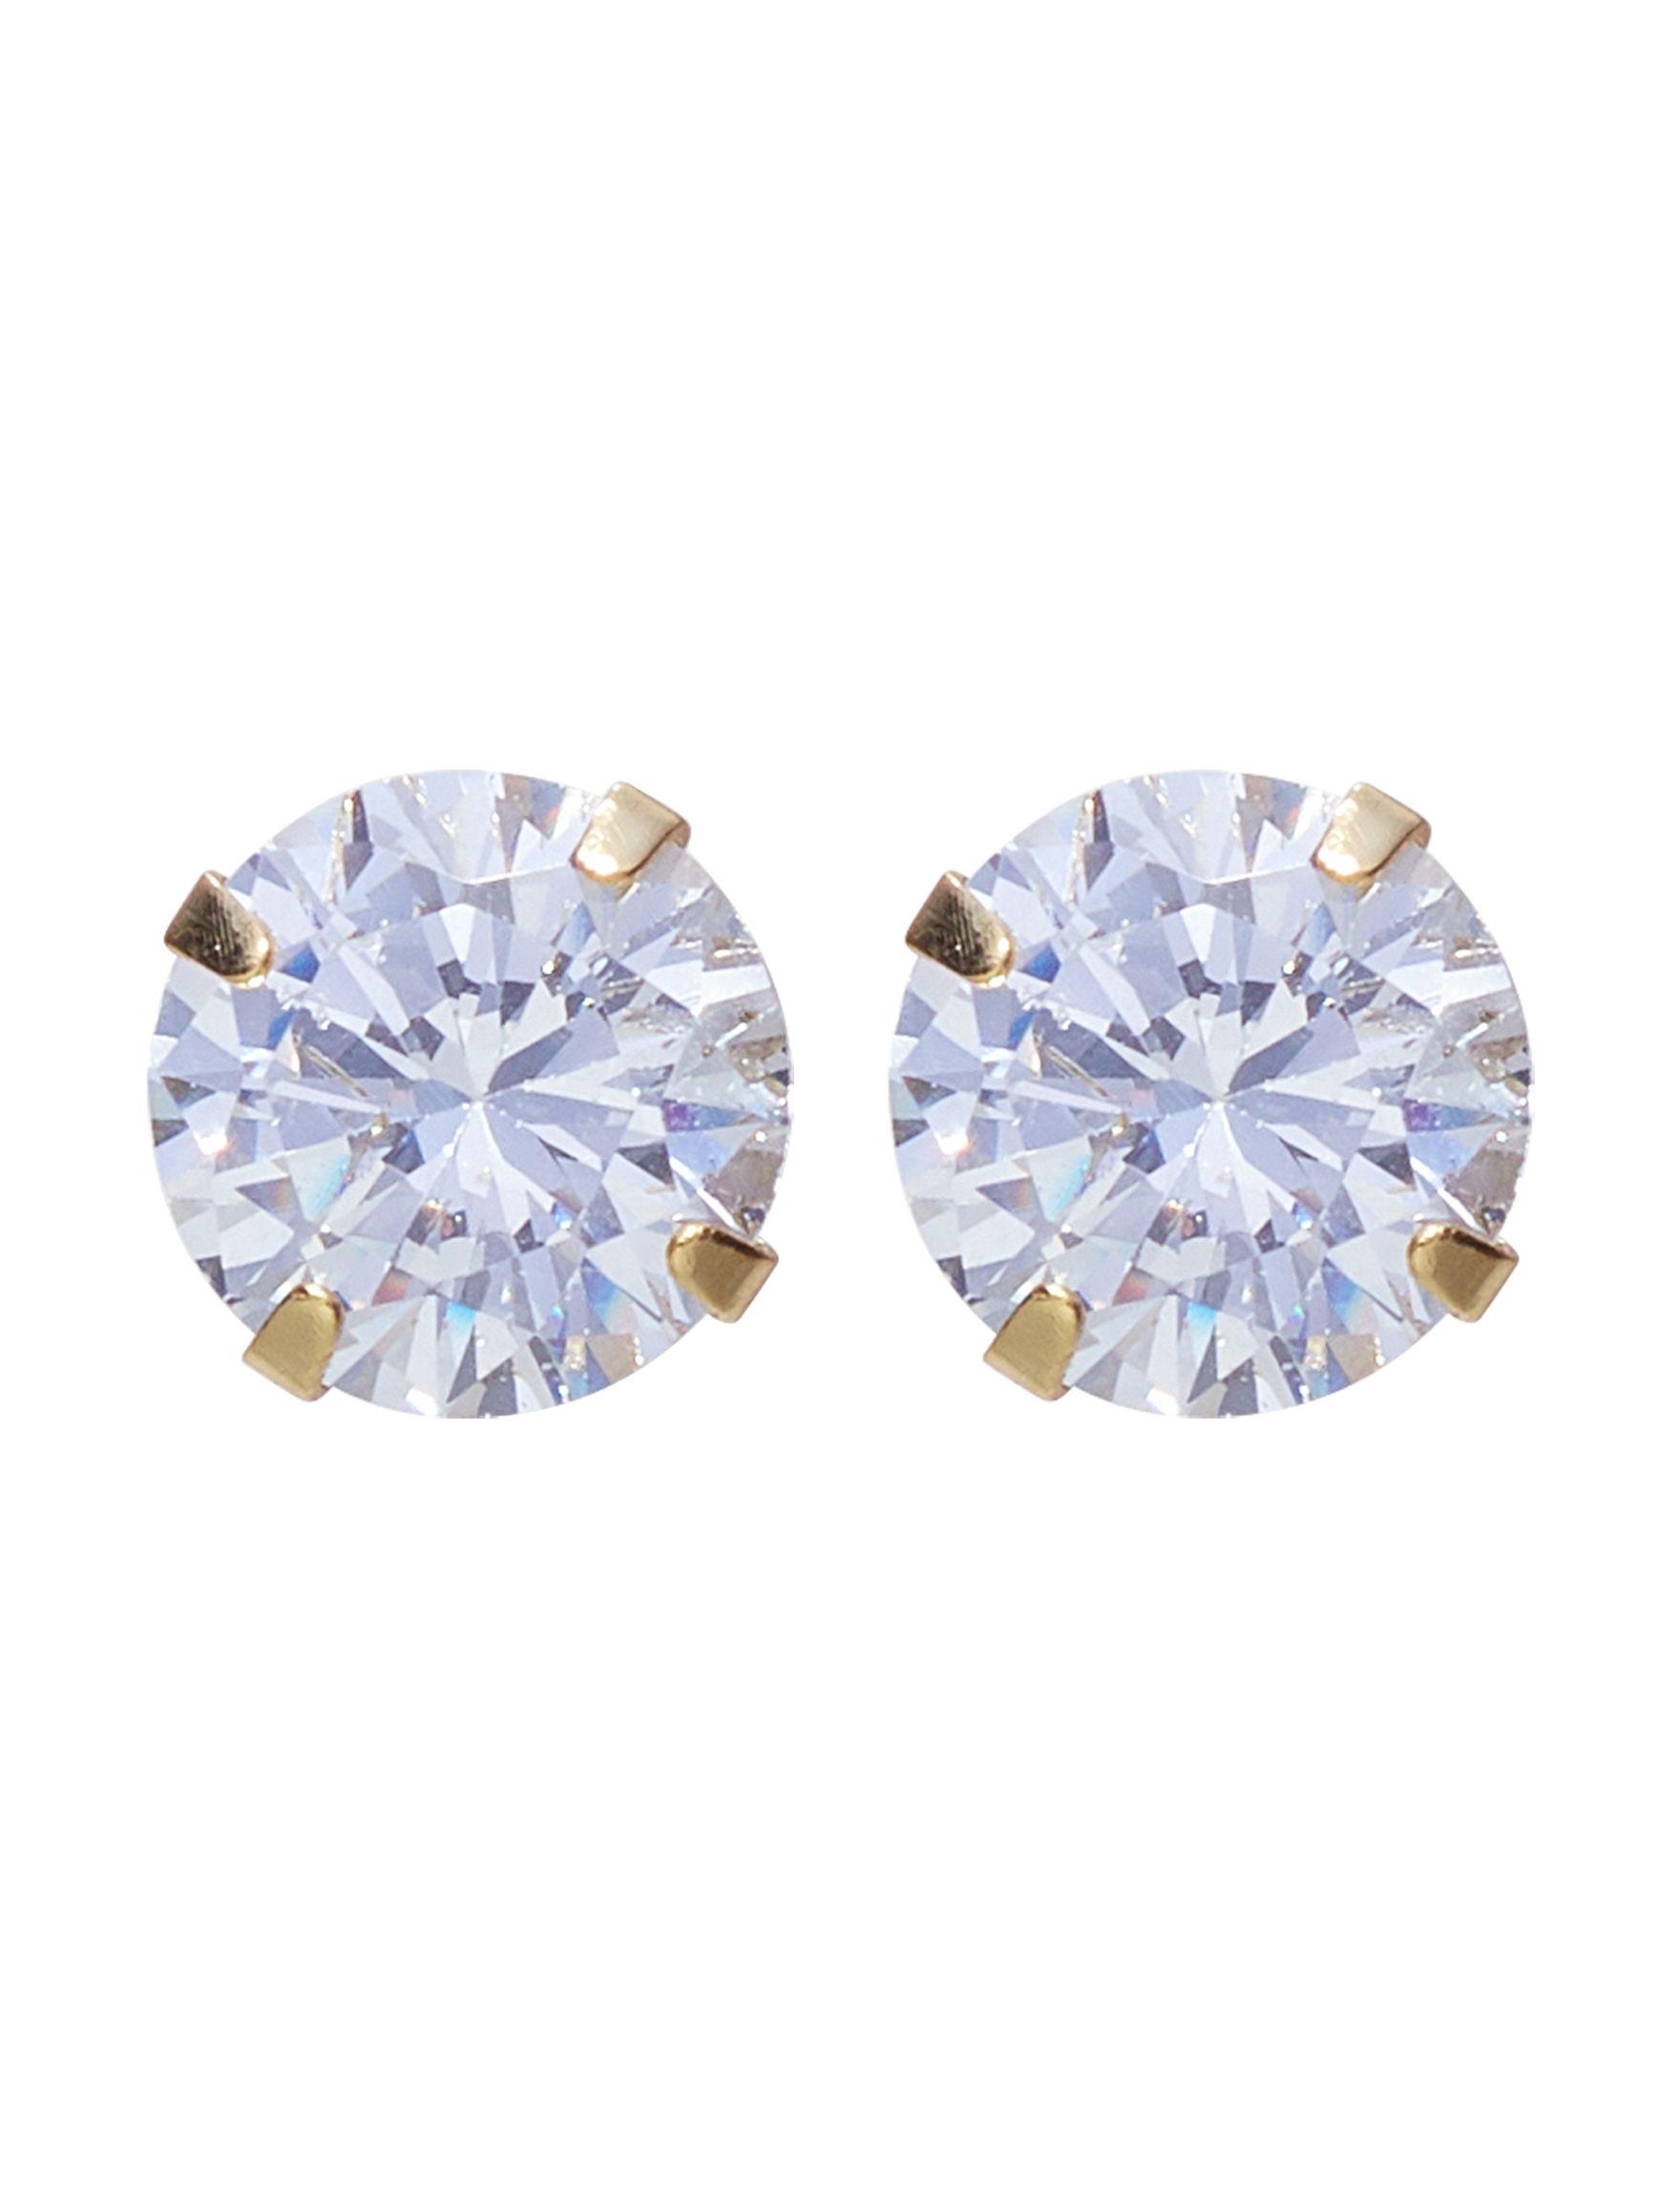 Marsala Gold / Crystal Studs Fine Jewelry